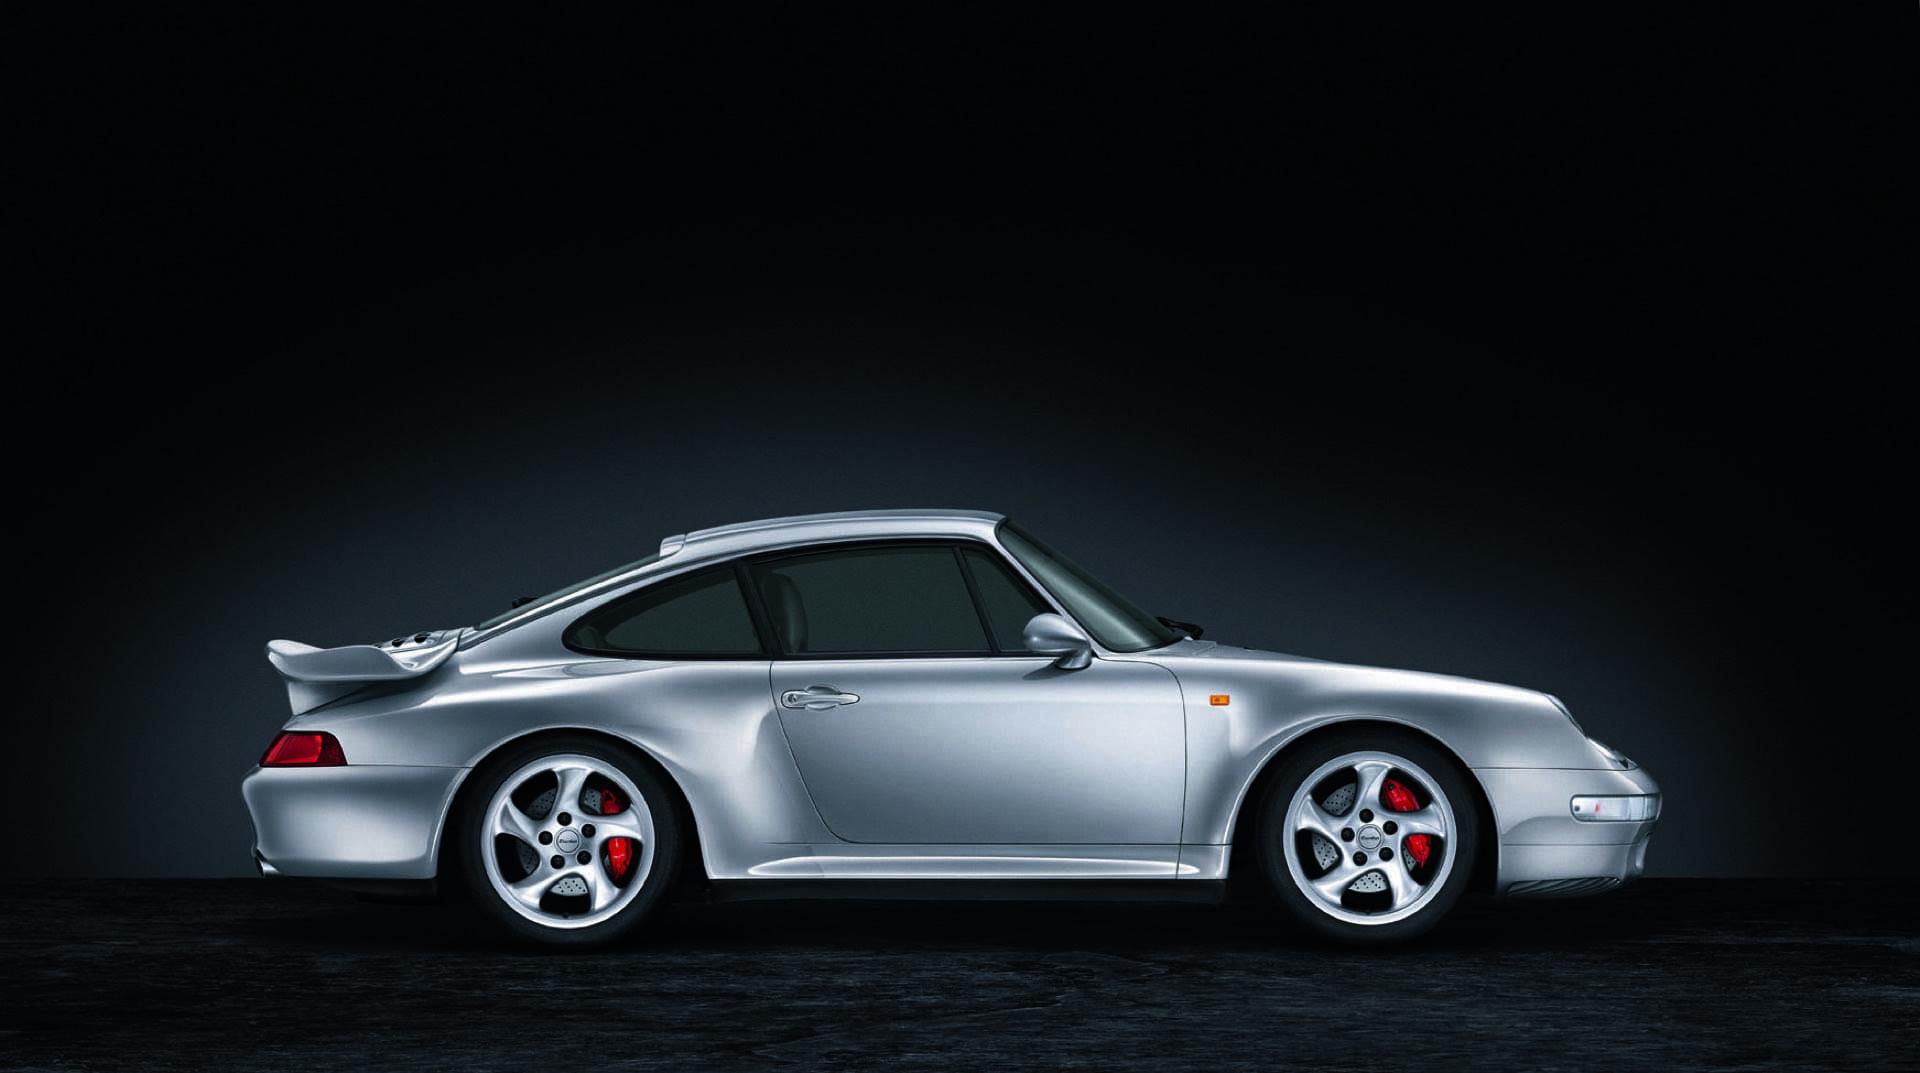 Porsche 911 993 Turbo 1995